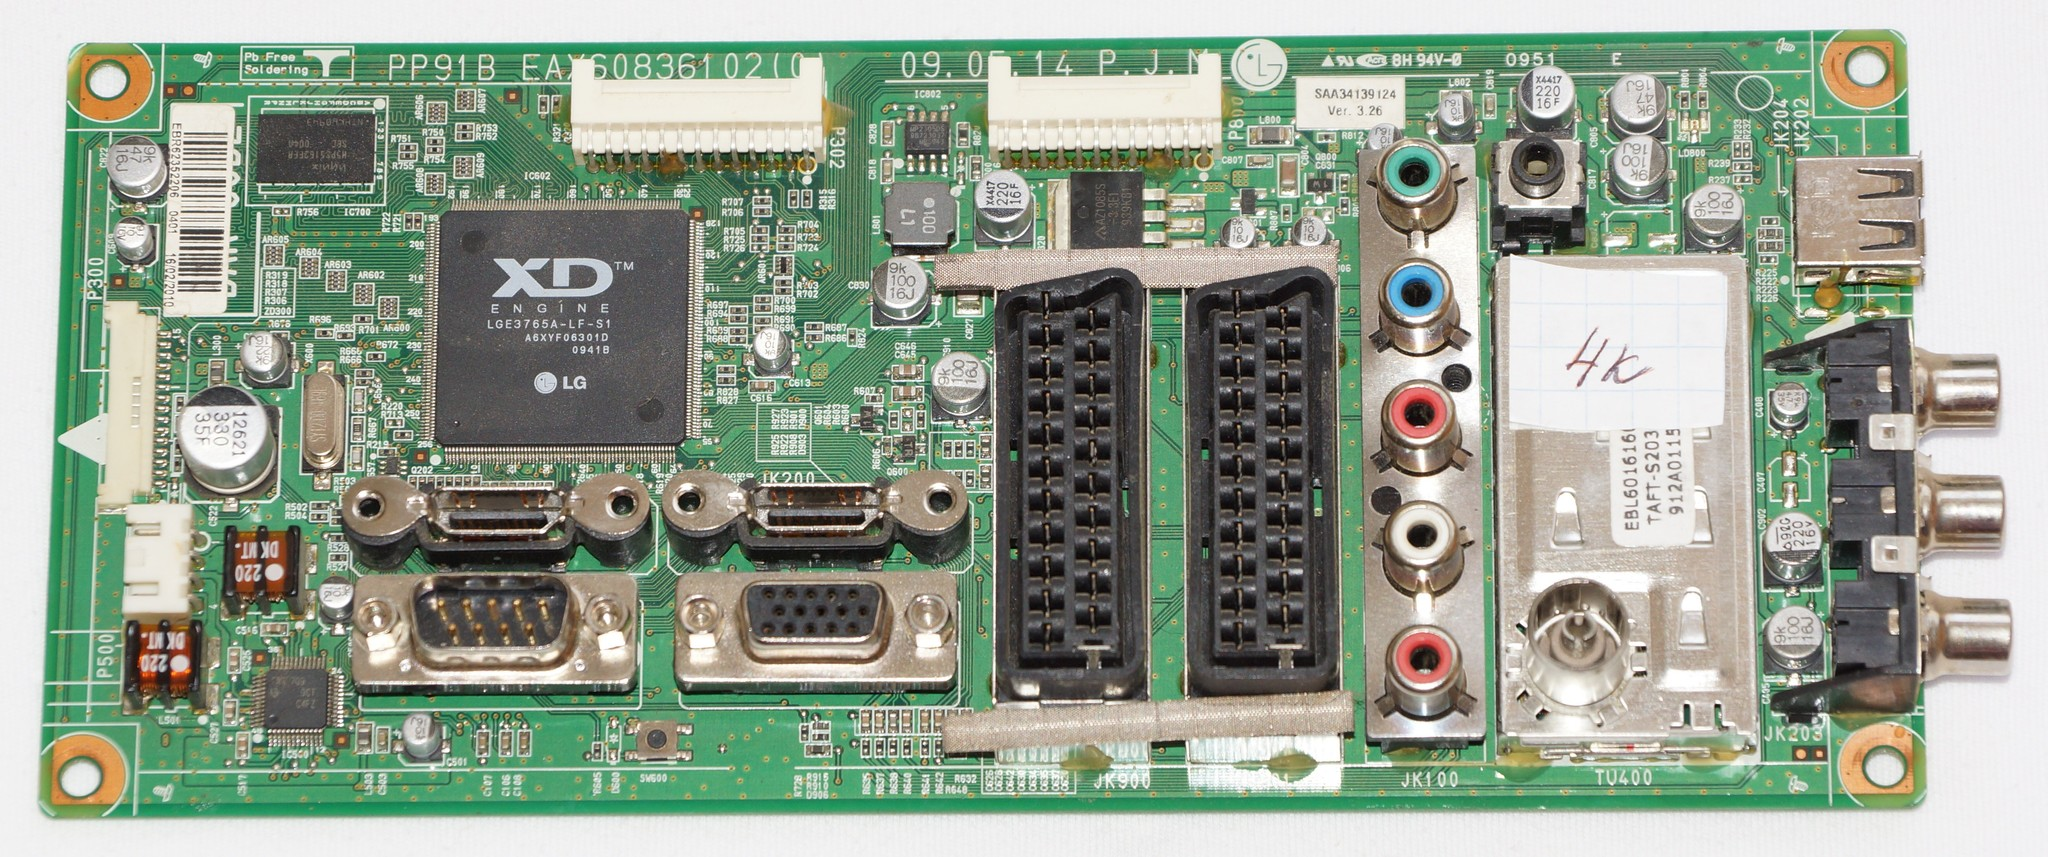 EAX60836102(0) EBR62352206 mainboard телевизора LG